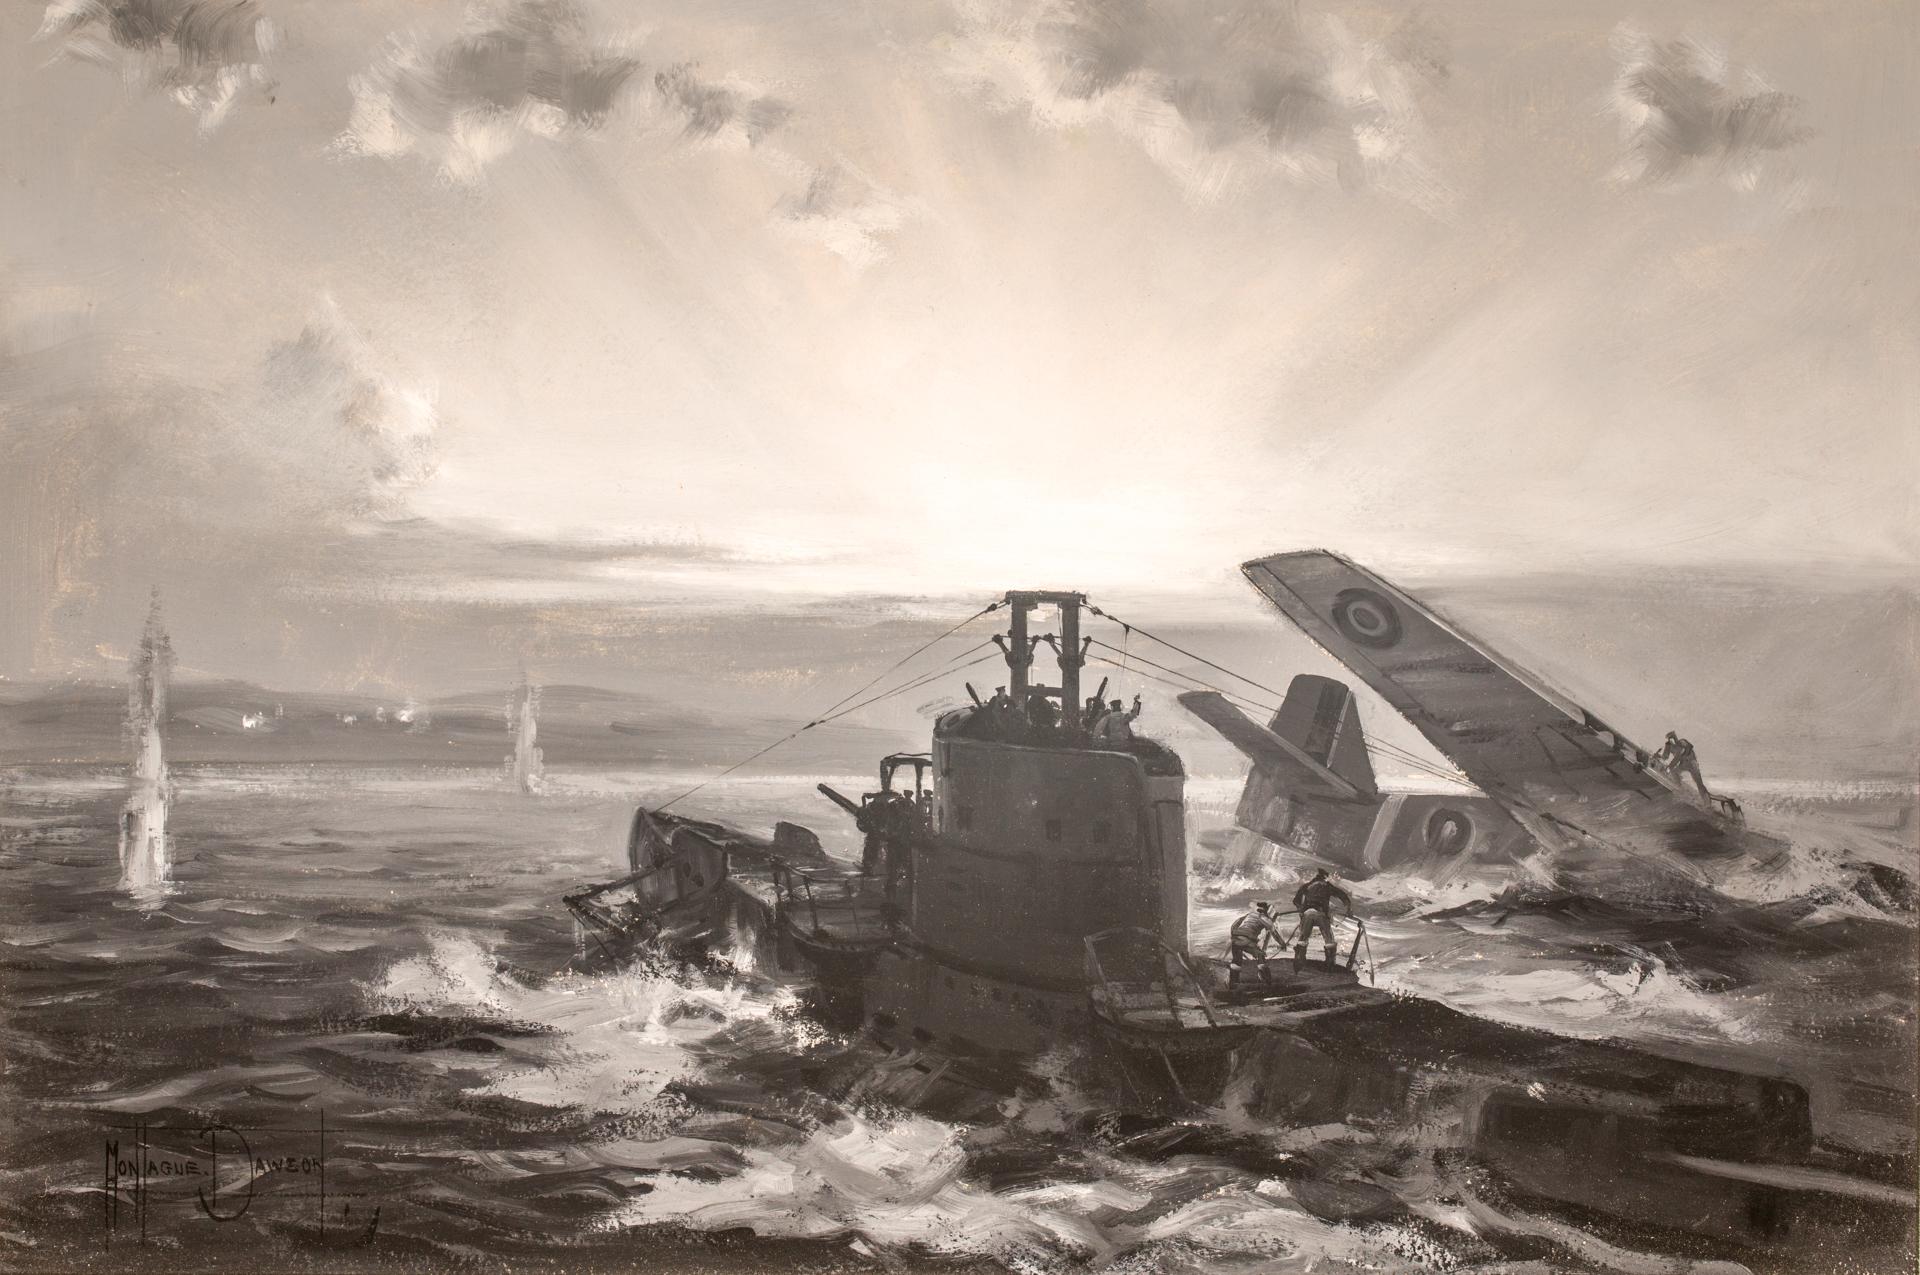 British Submarine H.M.S. SEALION  Rescues a P-51 Mustang Pilot